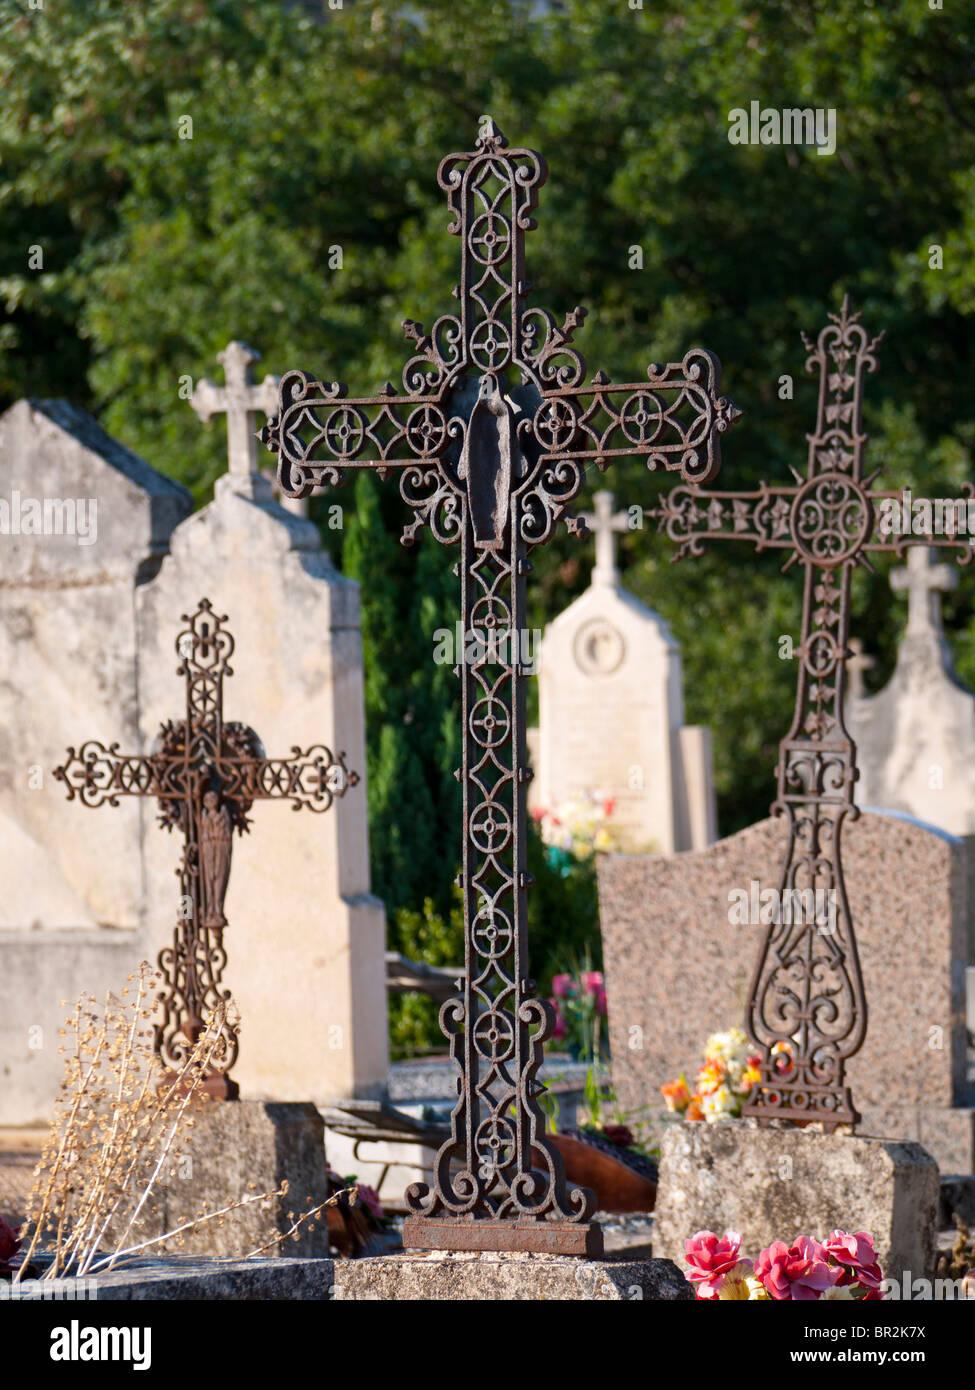 Grave crosses on the Fleurie graveyard in Beaujolais, France - Stock Image